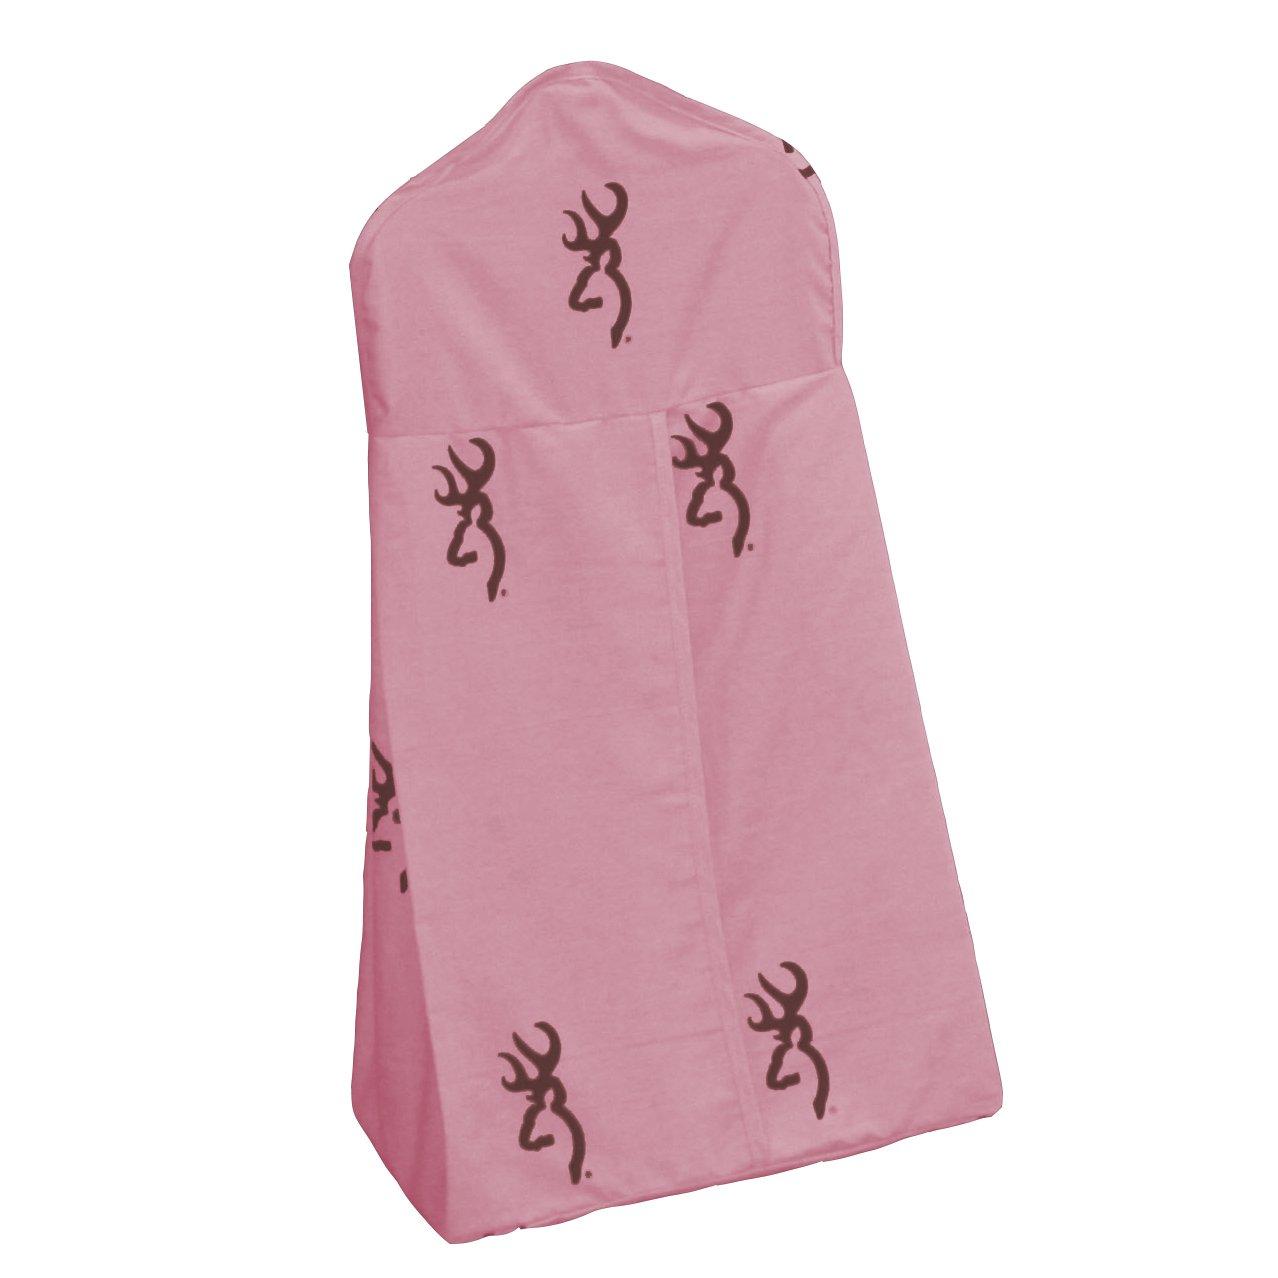 Pink Buckmark - 6 Piece Crib Set includes (Crib Fitted Sheet, Crib Bumper Pad, Crib Headboard Pad, Crib Comforter, Crib Bedskirt and Crib Diaper Stacker)- Save Big By Bundling!